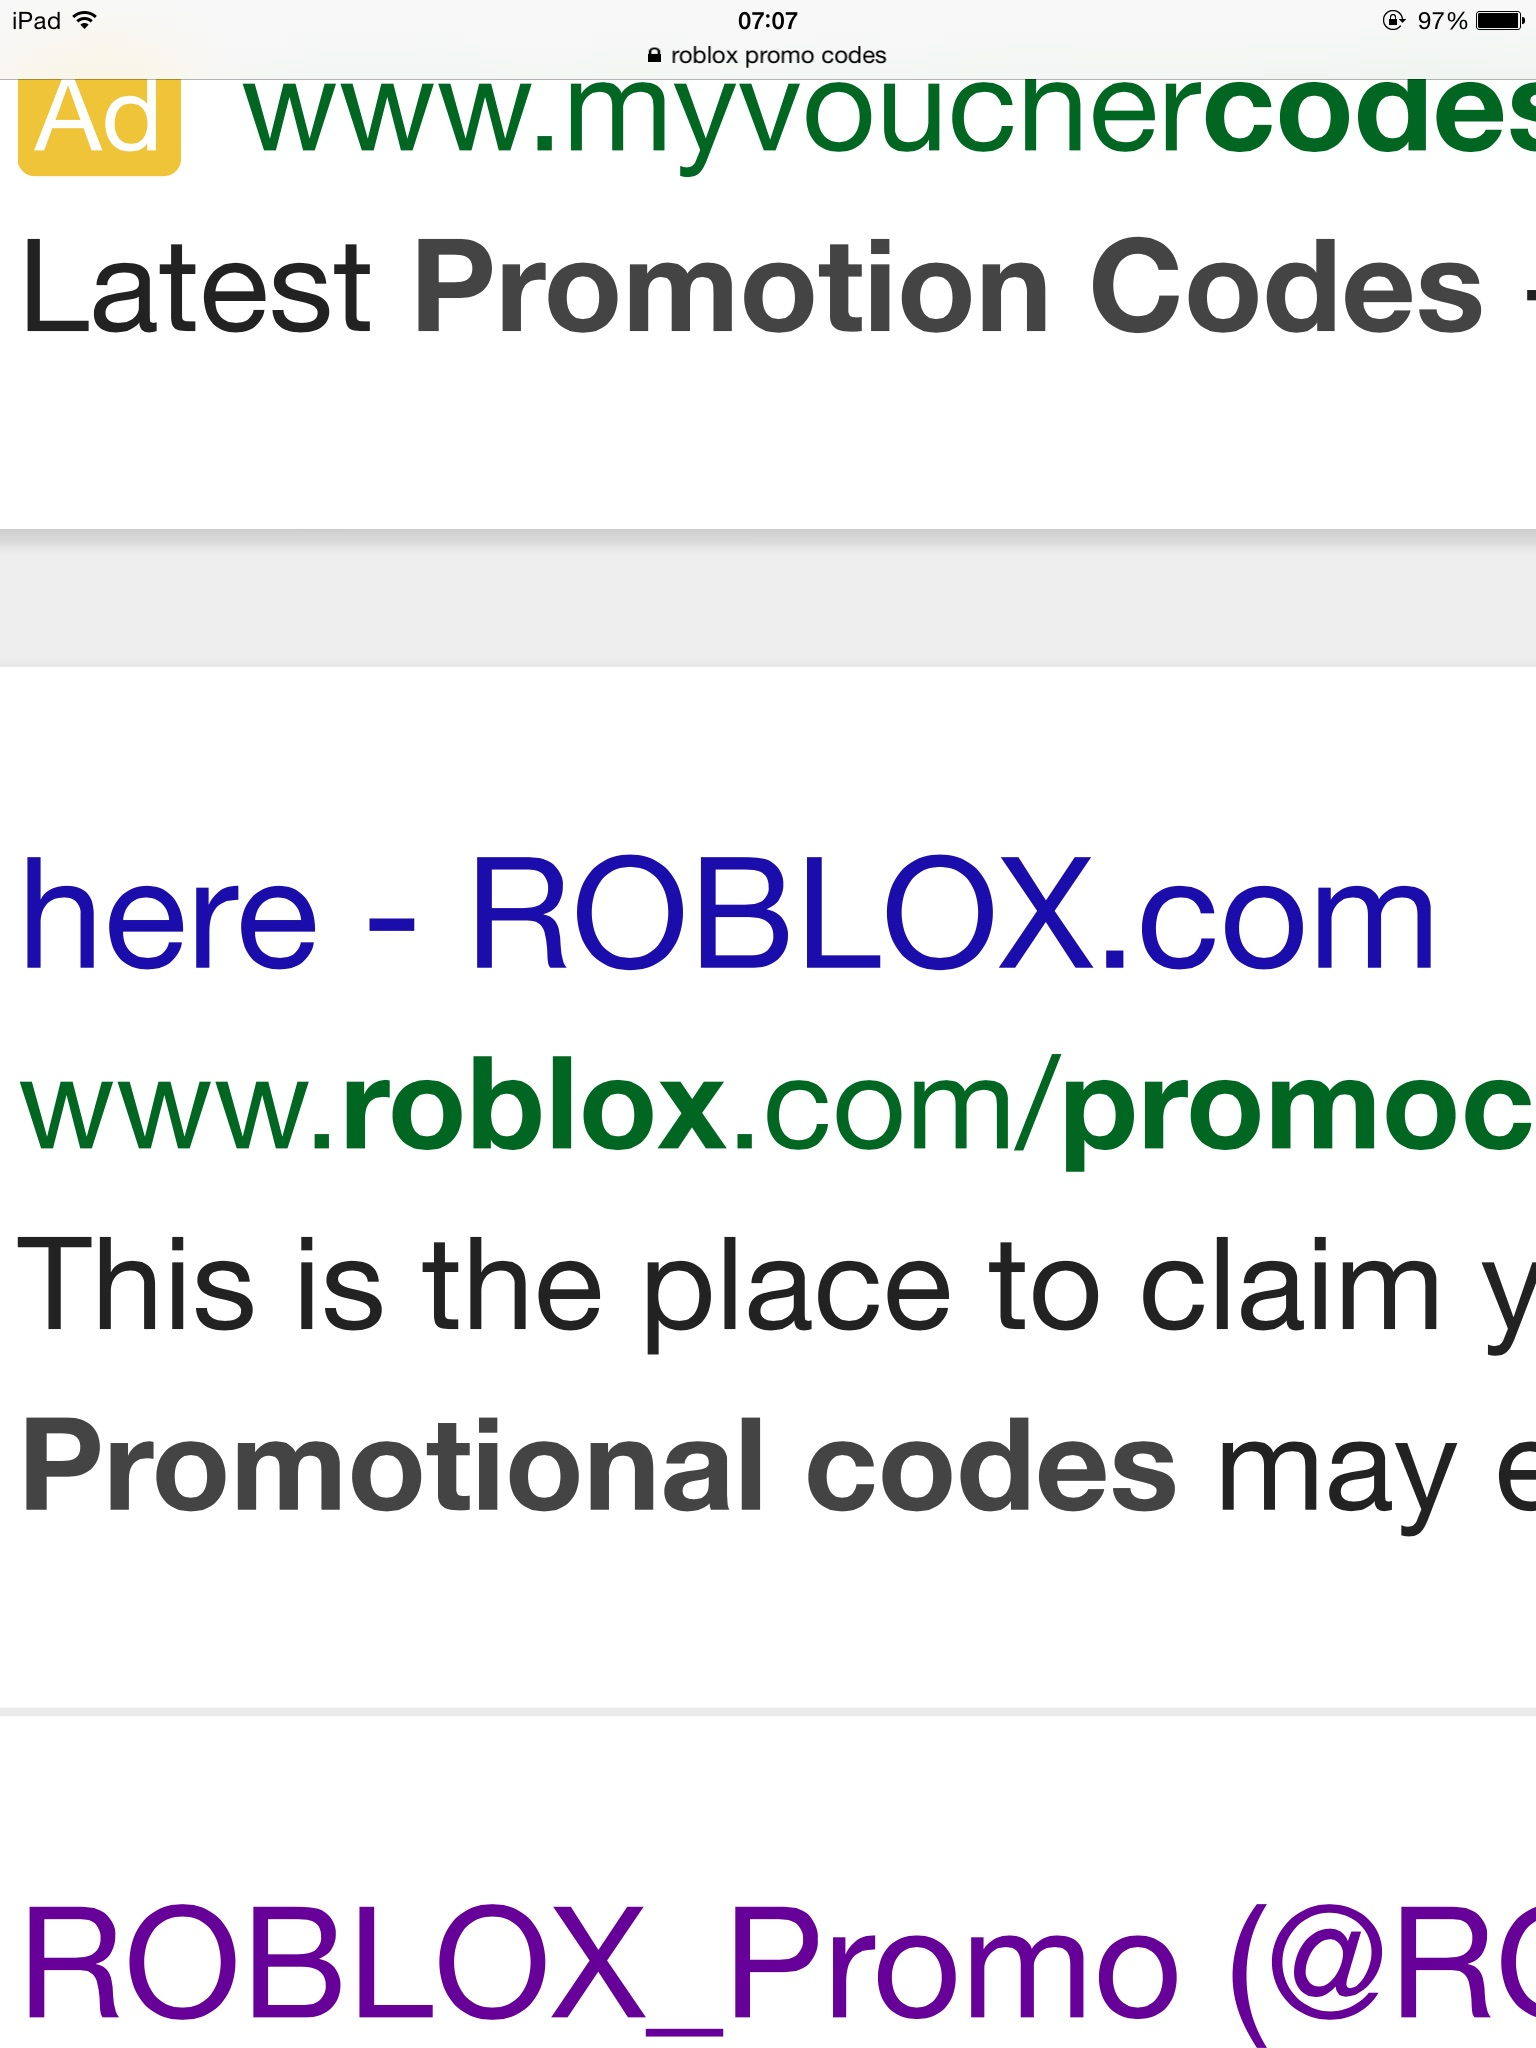 Roblox.com Promo Codes Wiki Talk Home Page Comment 26443415 20150820060926 R2d Wiki Fandom